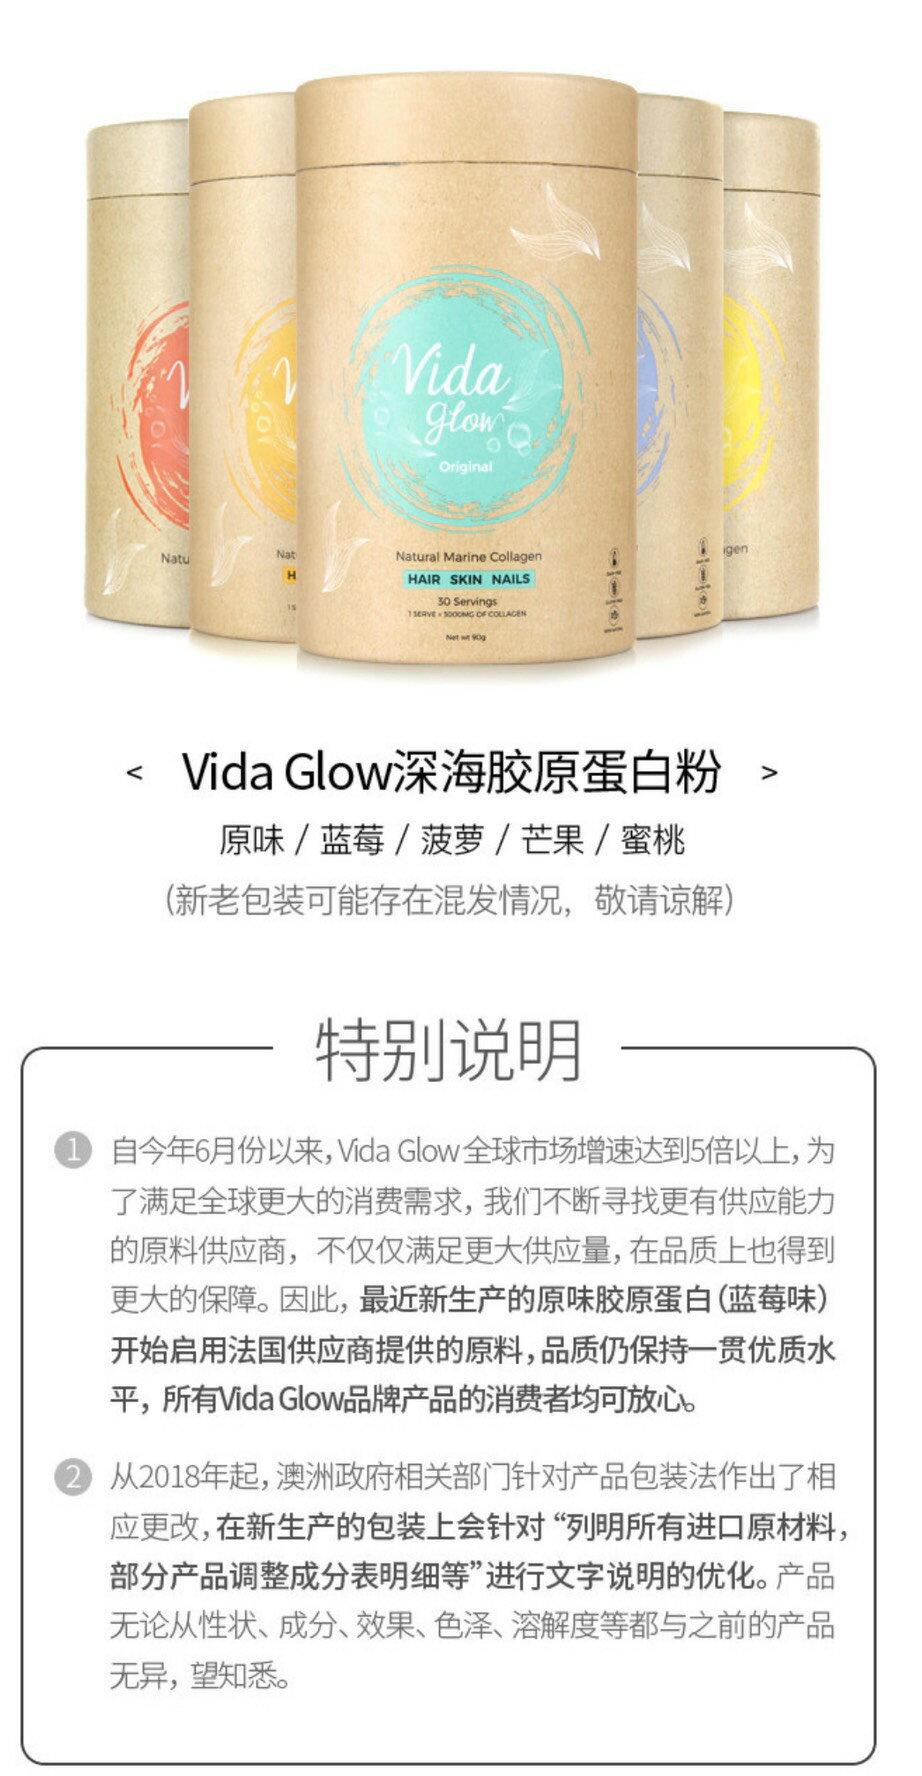 Vida Glow 頂級深海膠原蛋白粉-原味 30包入